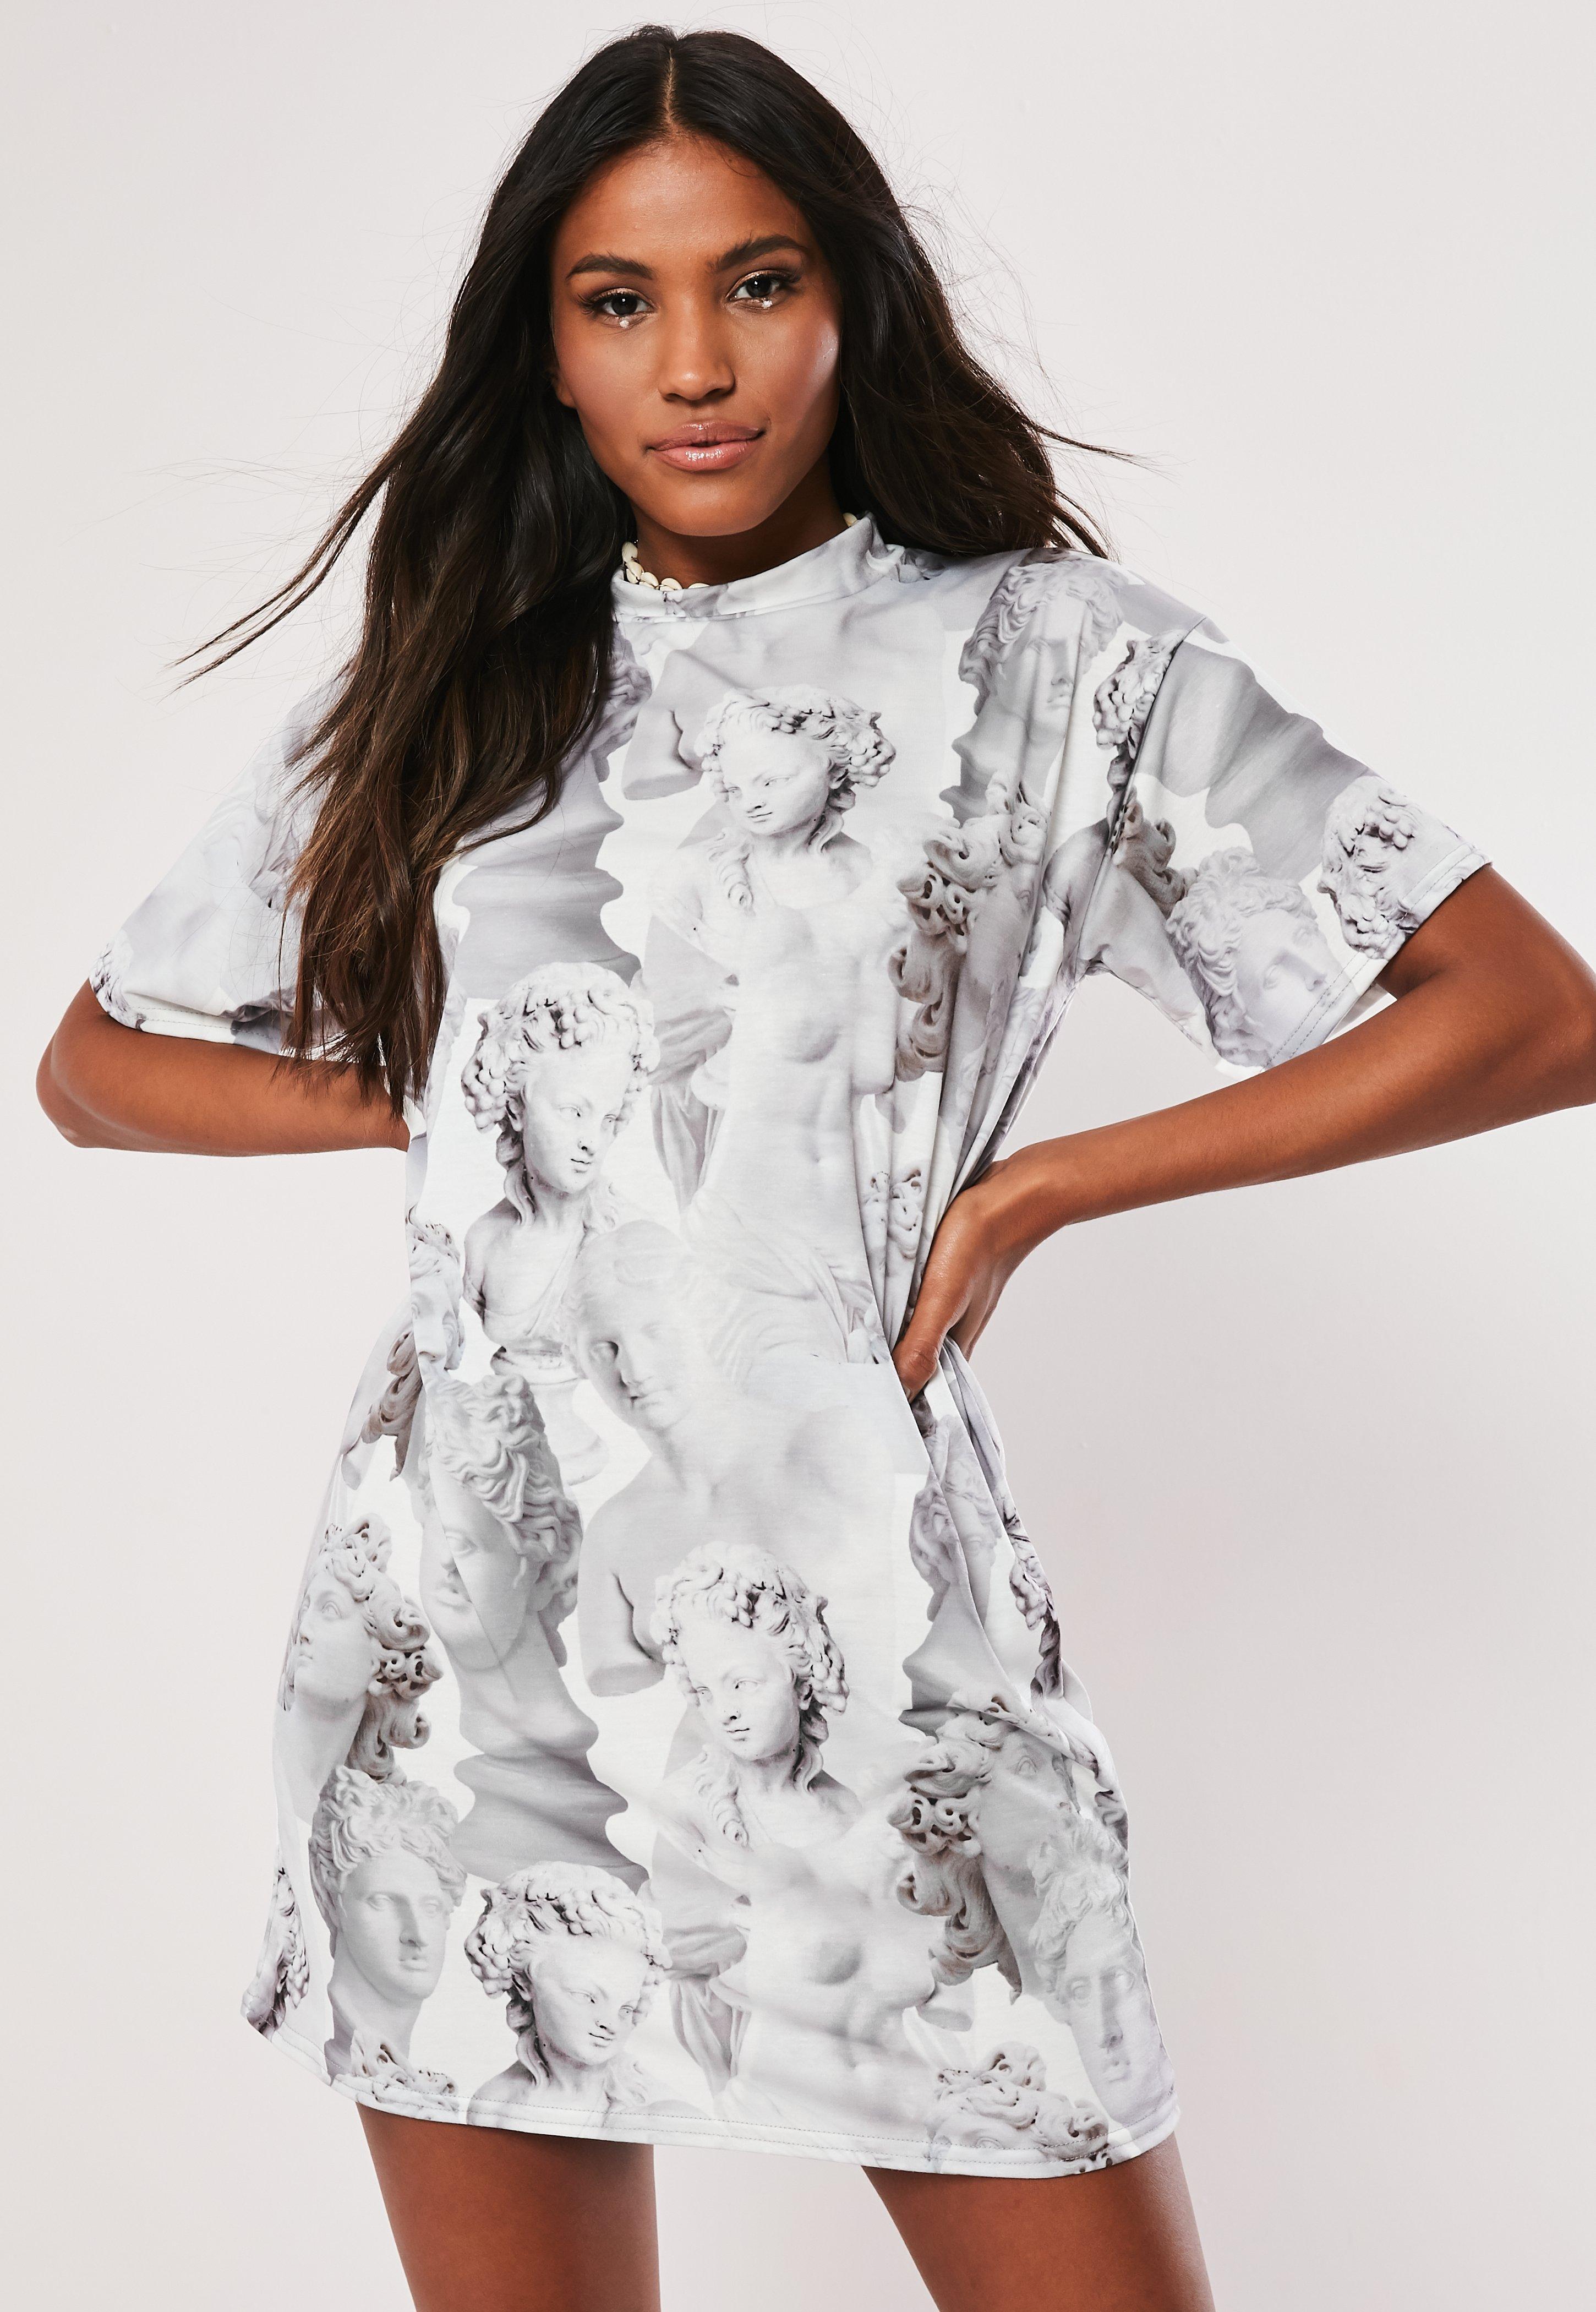 23689daed4c4 T-Shirt Dresses